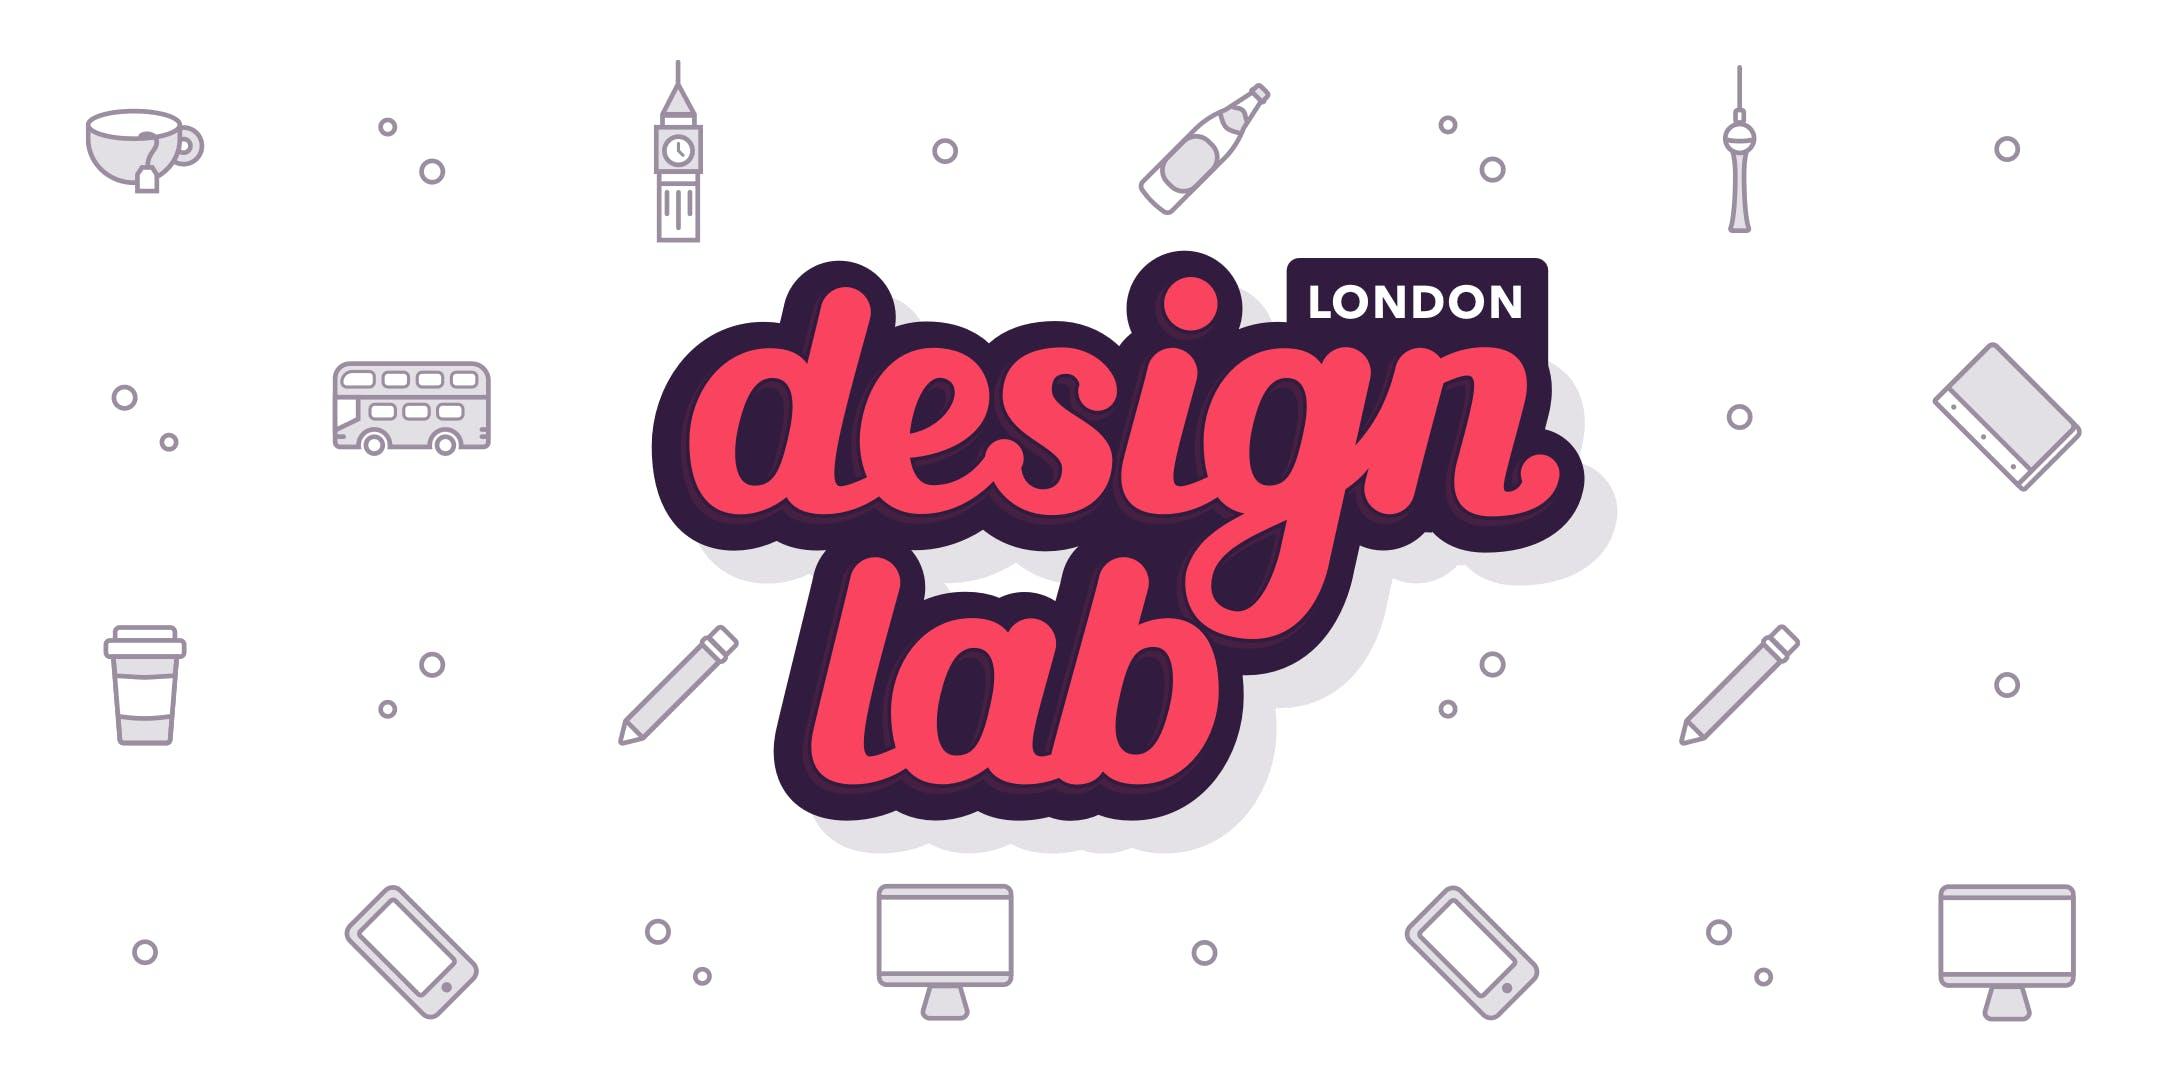 May design lab - LONDON